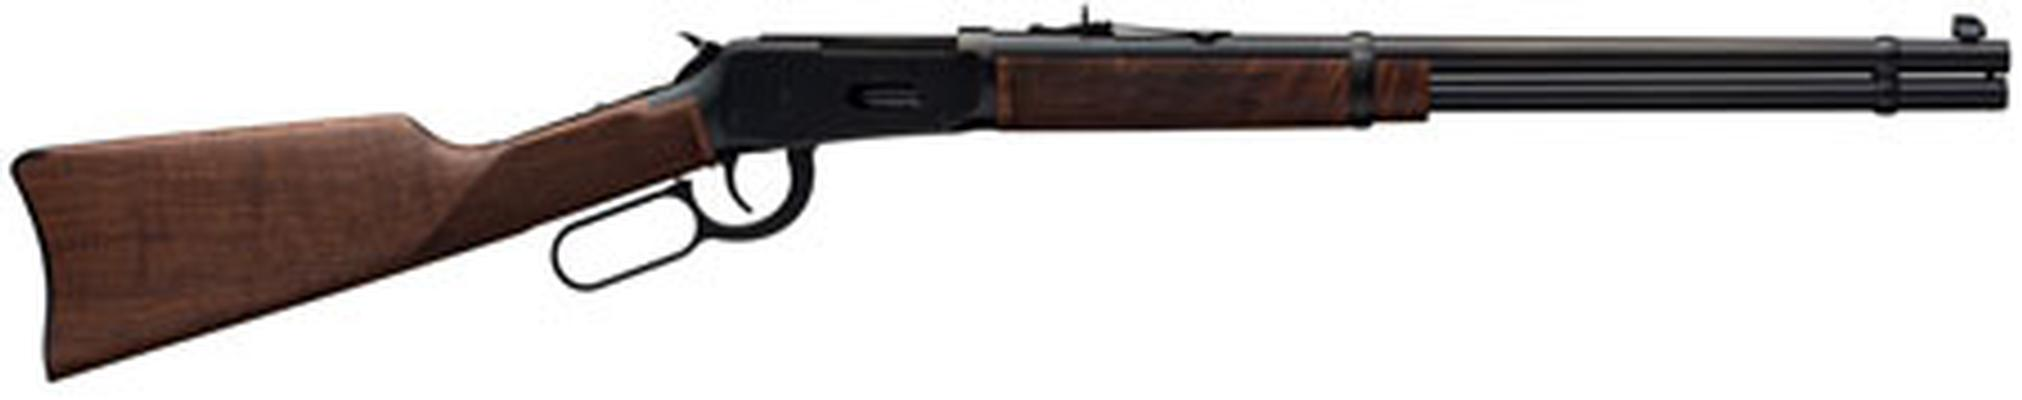 38-55 WIN M94 DELUXE CARBINE